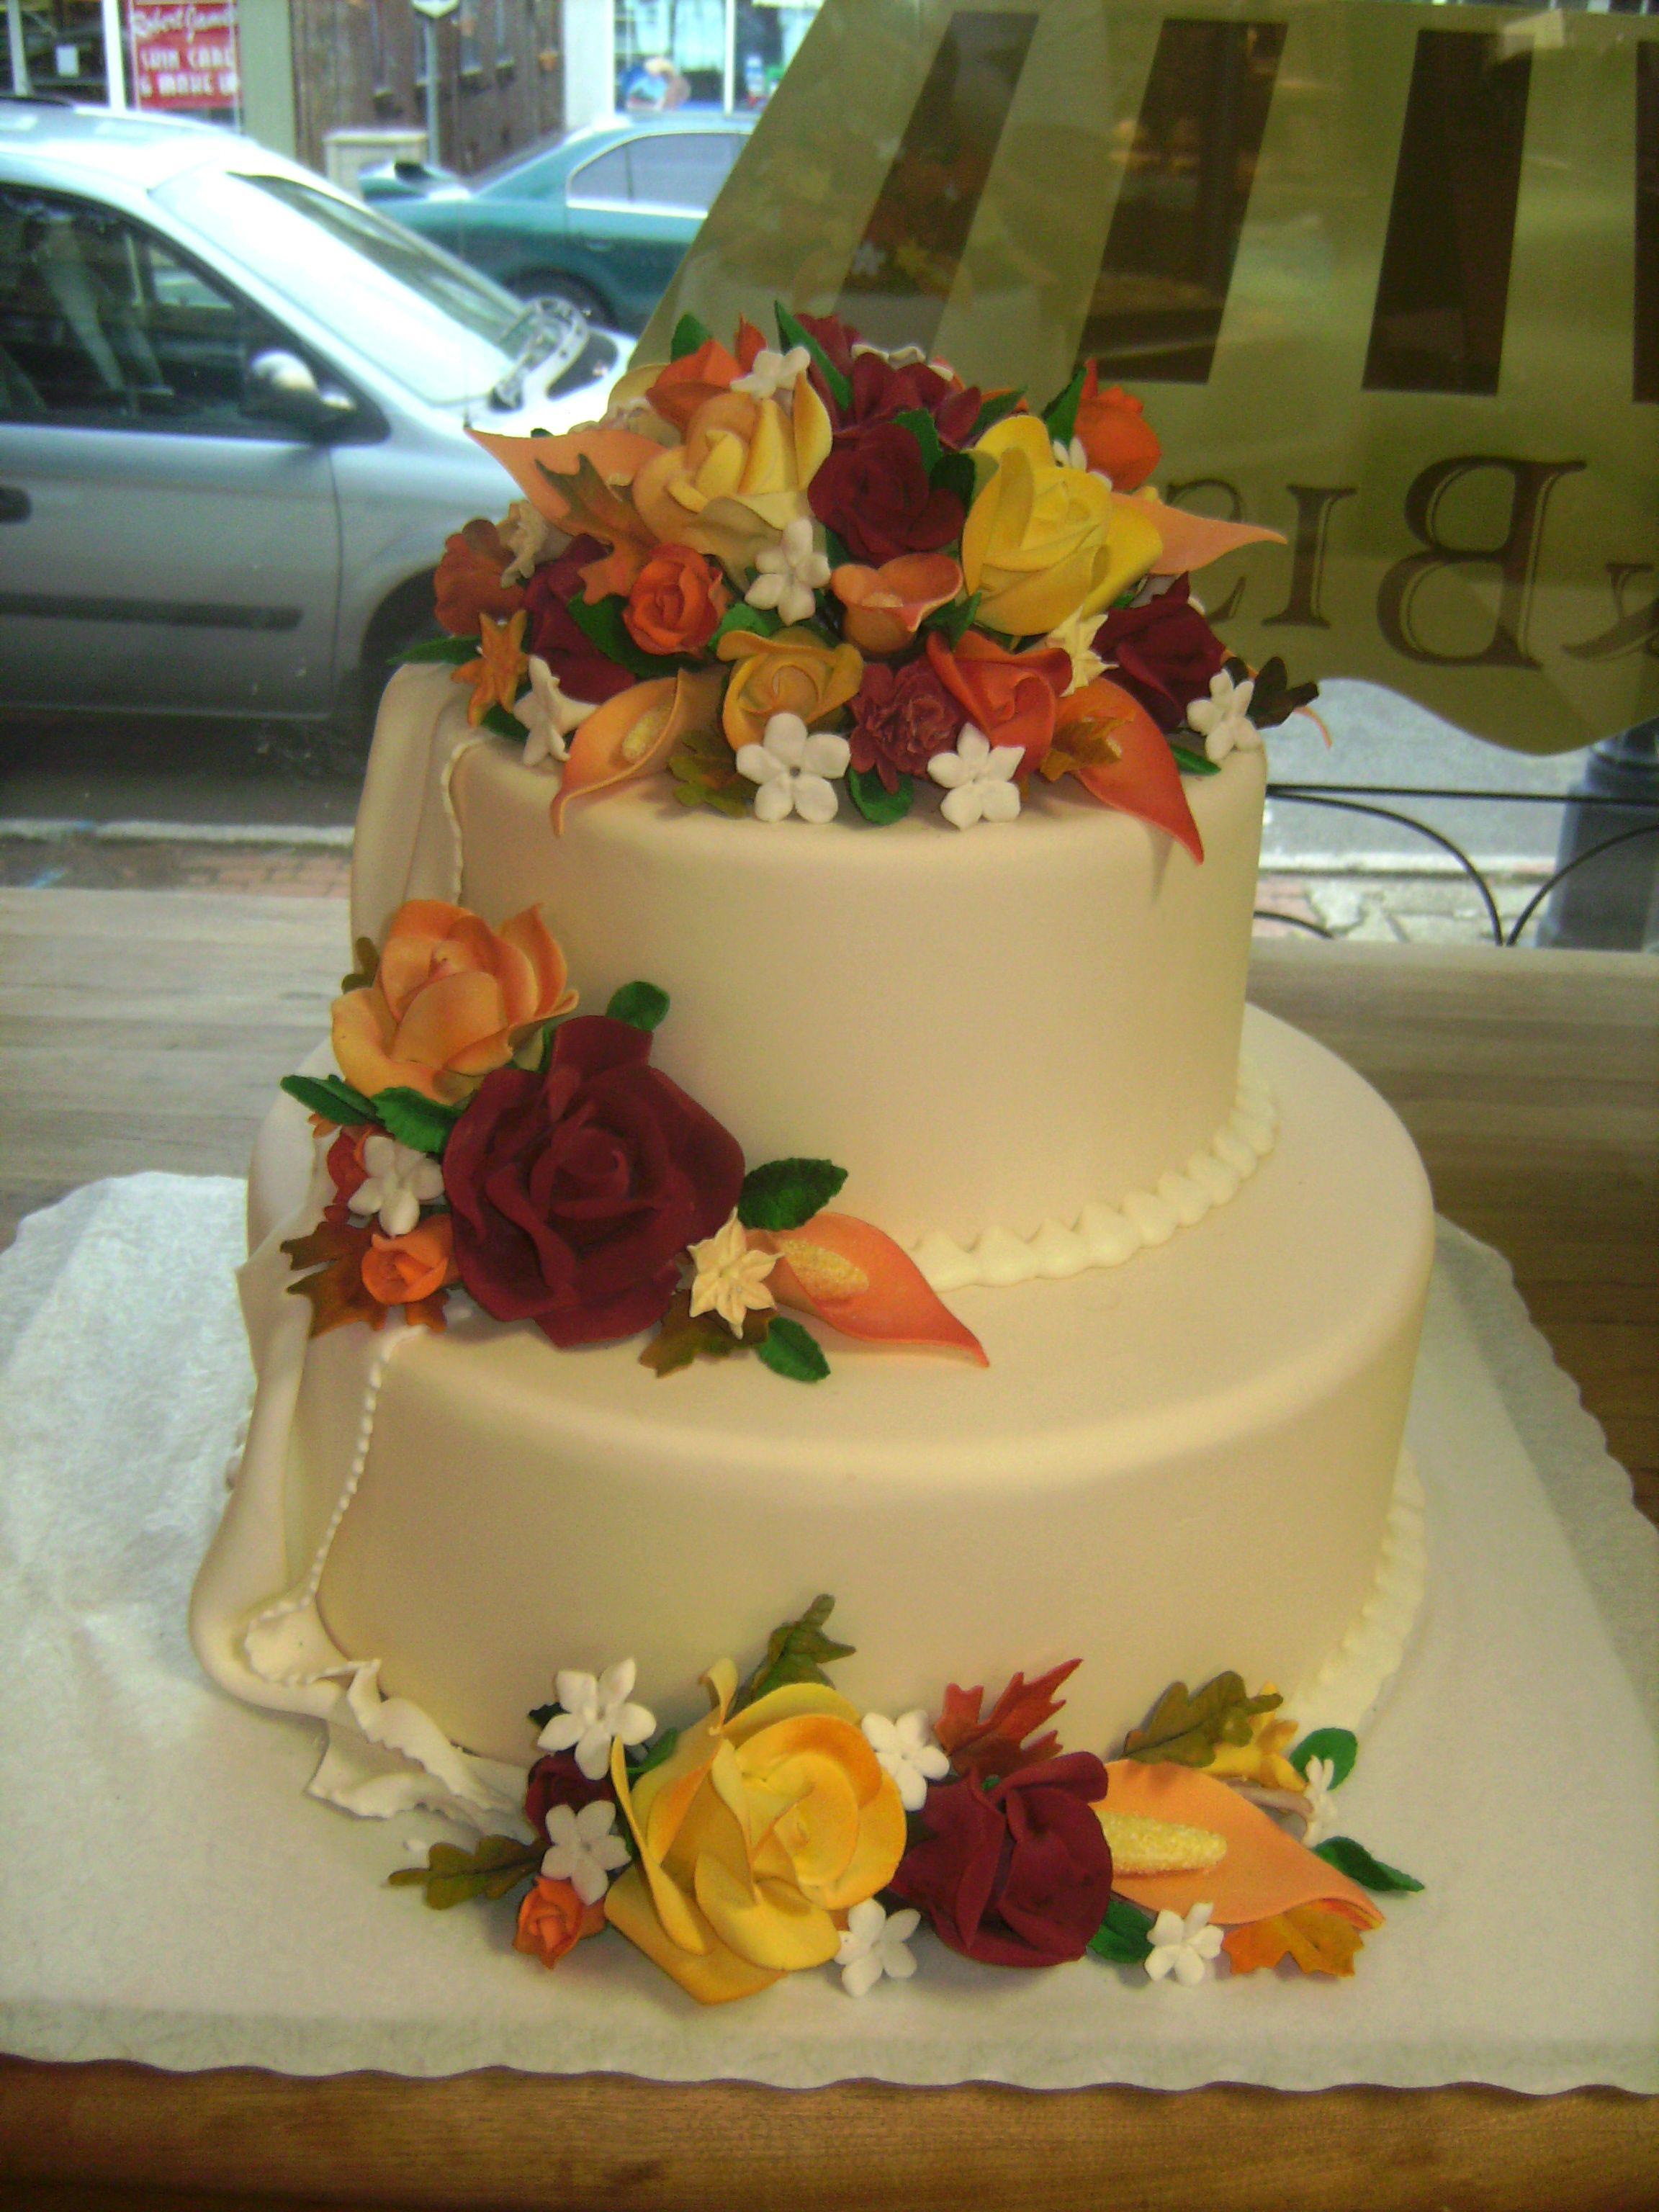 Festive Autumn Wedding Cake